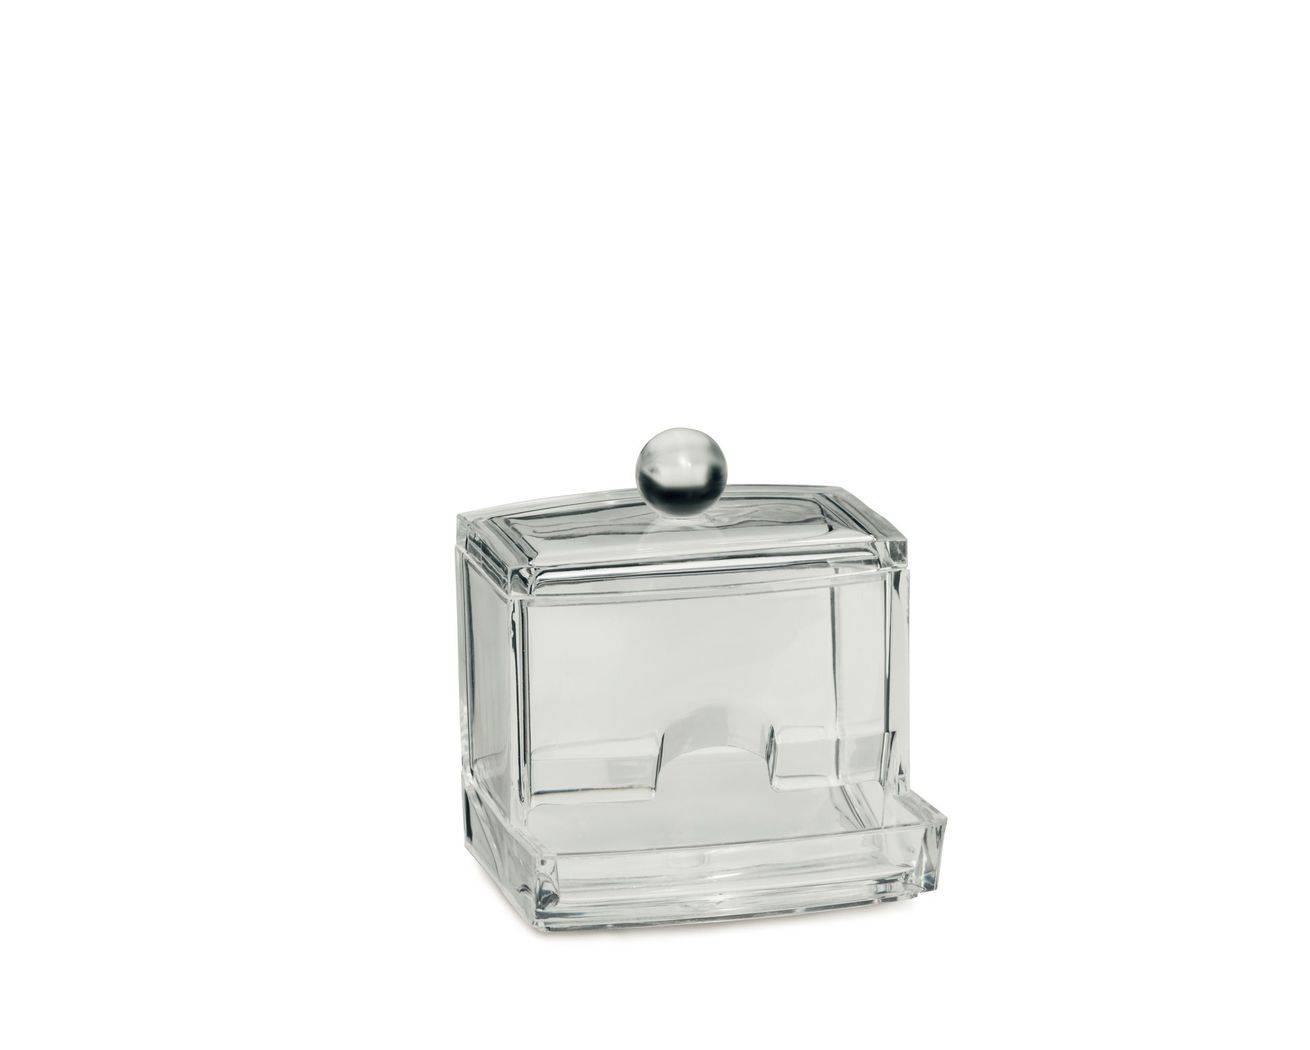 Kosmetická dóza SAFIRA plast, transparent, 9x7x9,5cm - Kela